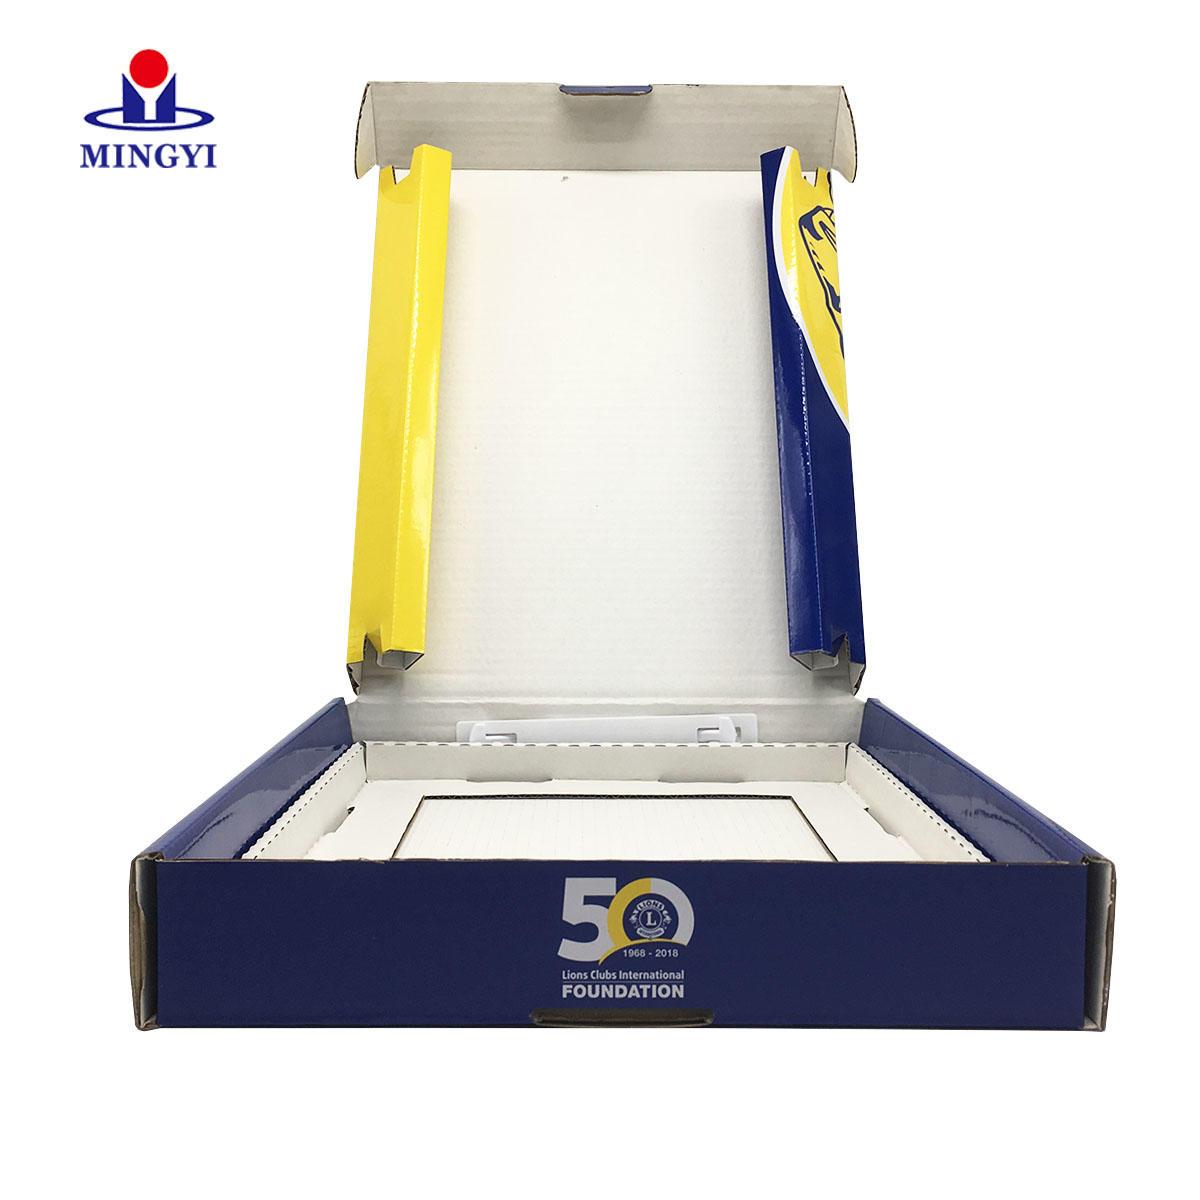 Mingyi Printing-commodity Custom pet custom size cardboard boxes alcohol Mingyi Printing